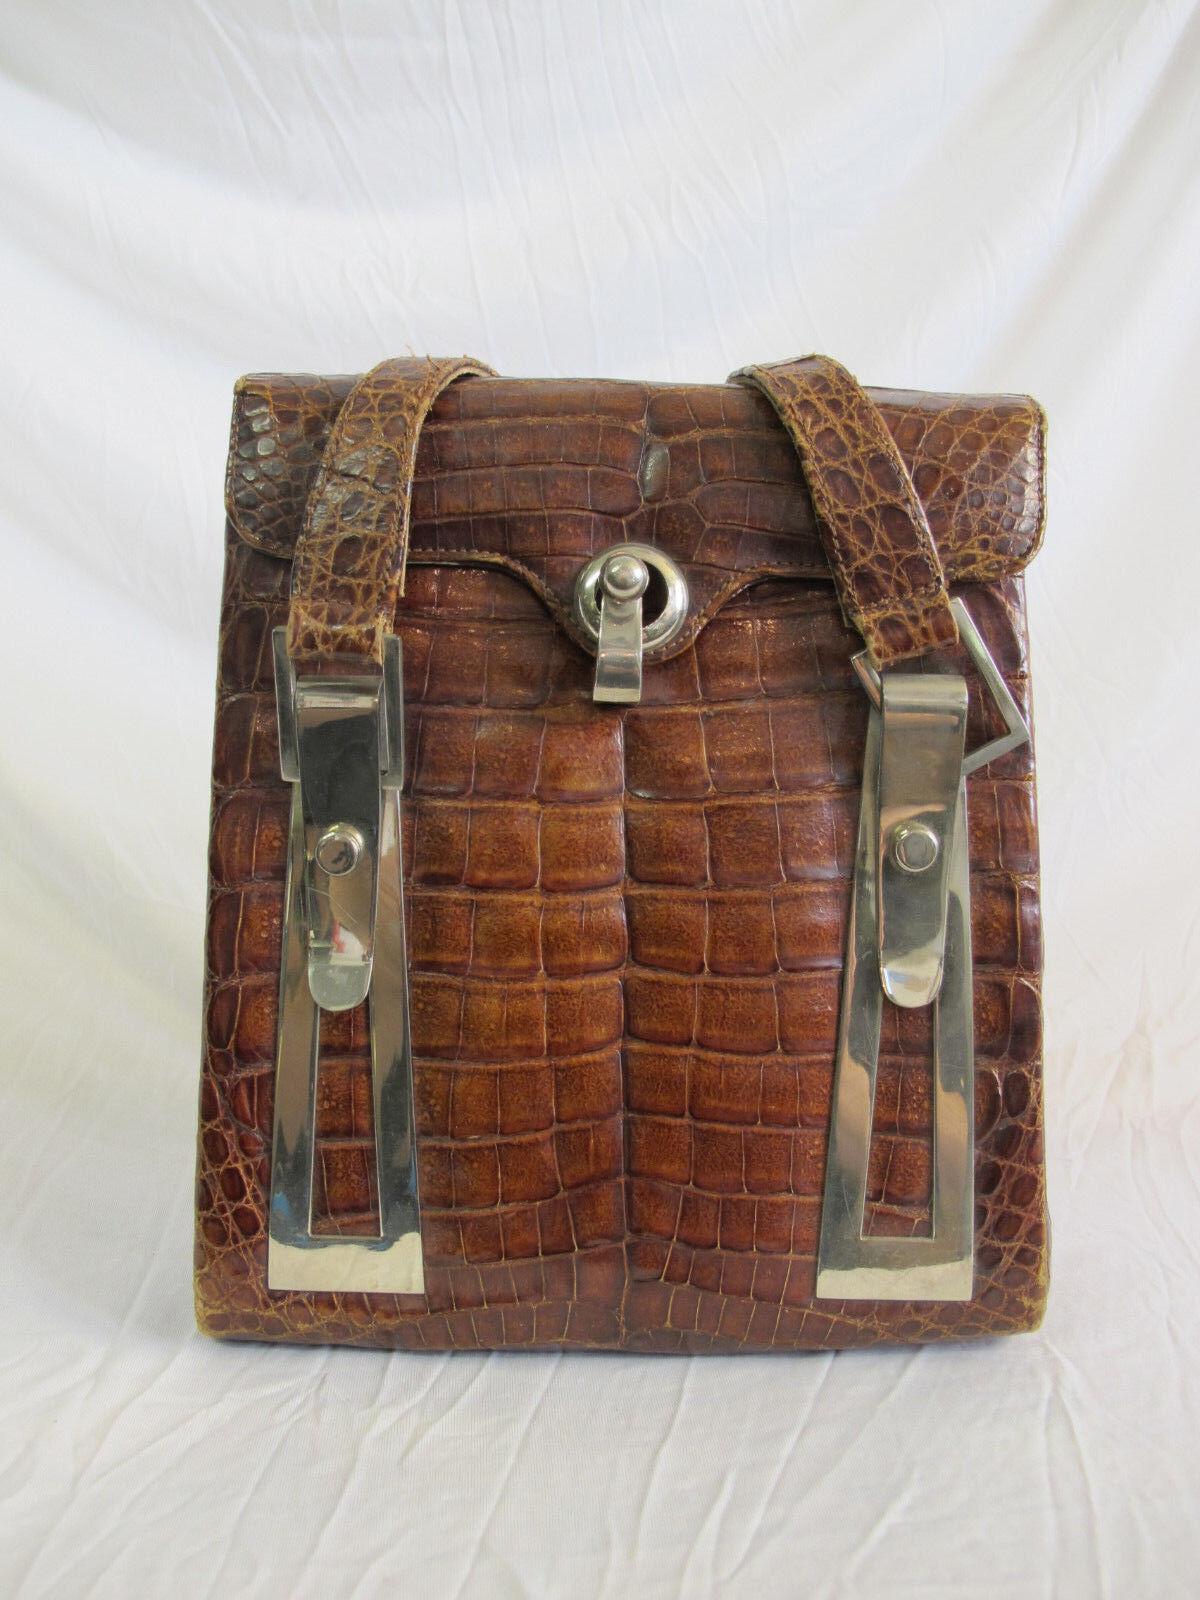 Vintage Kroko Optik Tasche Henkeltasche Damen Handtasche Schlange | Vollständige Spezifikation